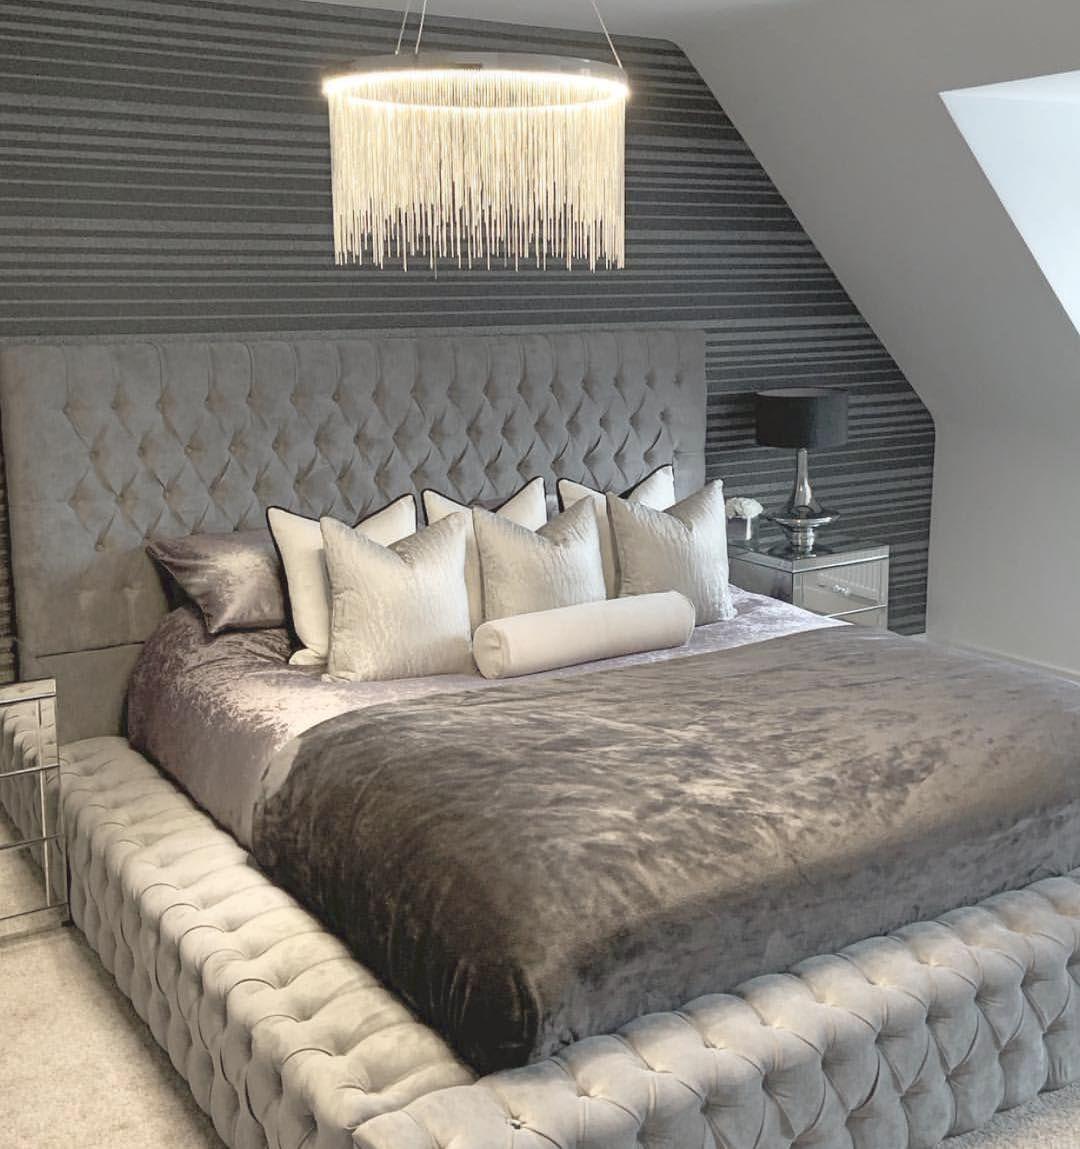 12+ Home decor inspiration instagram information